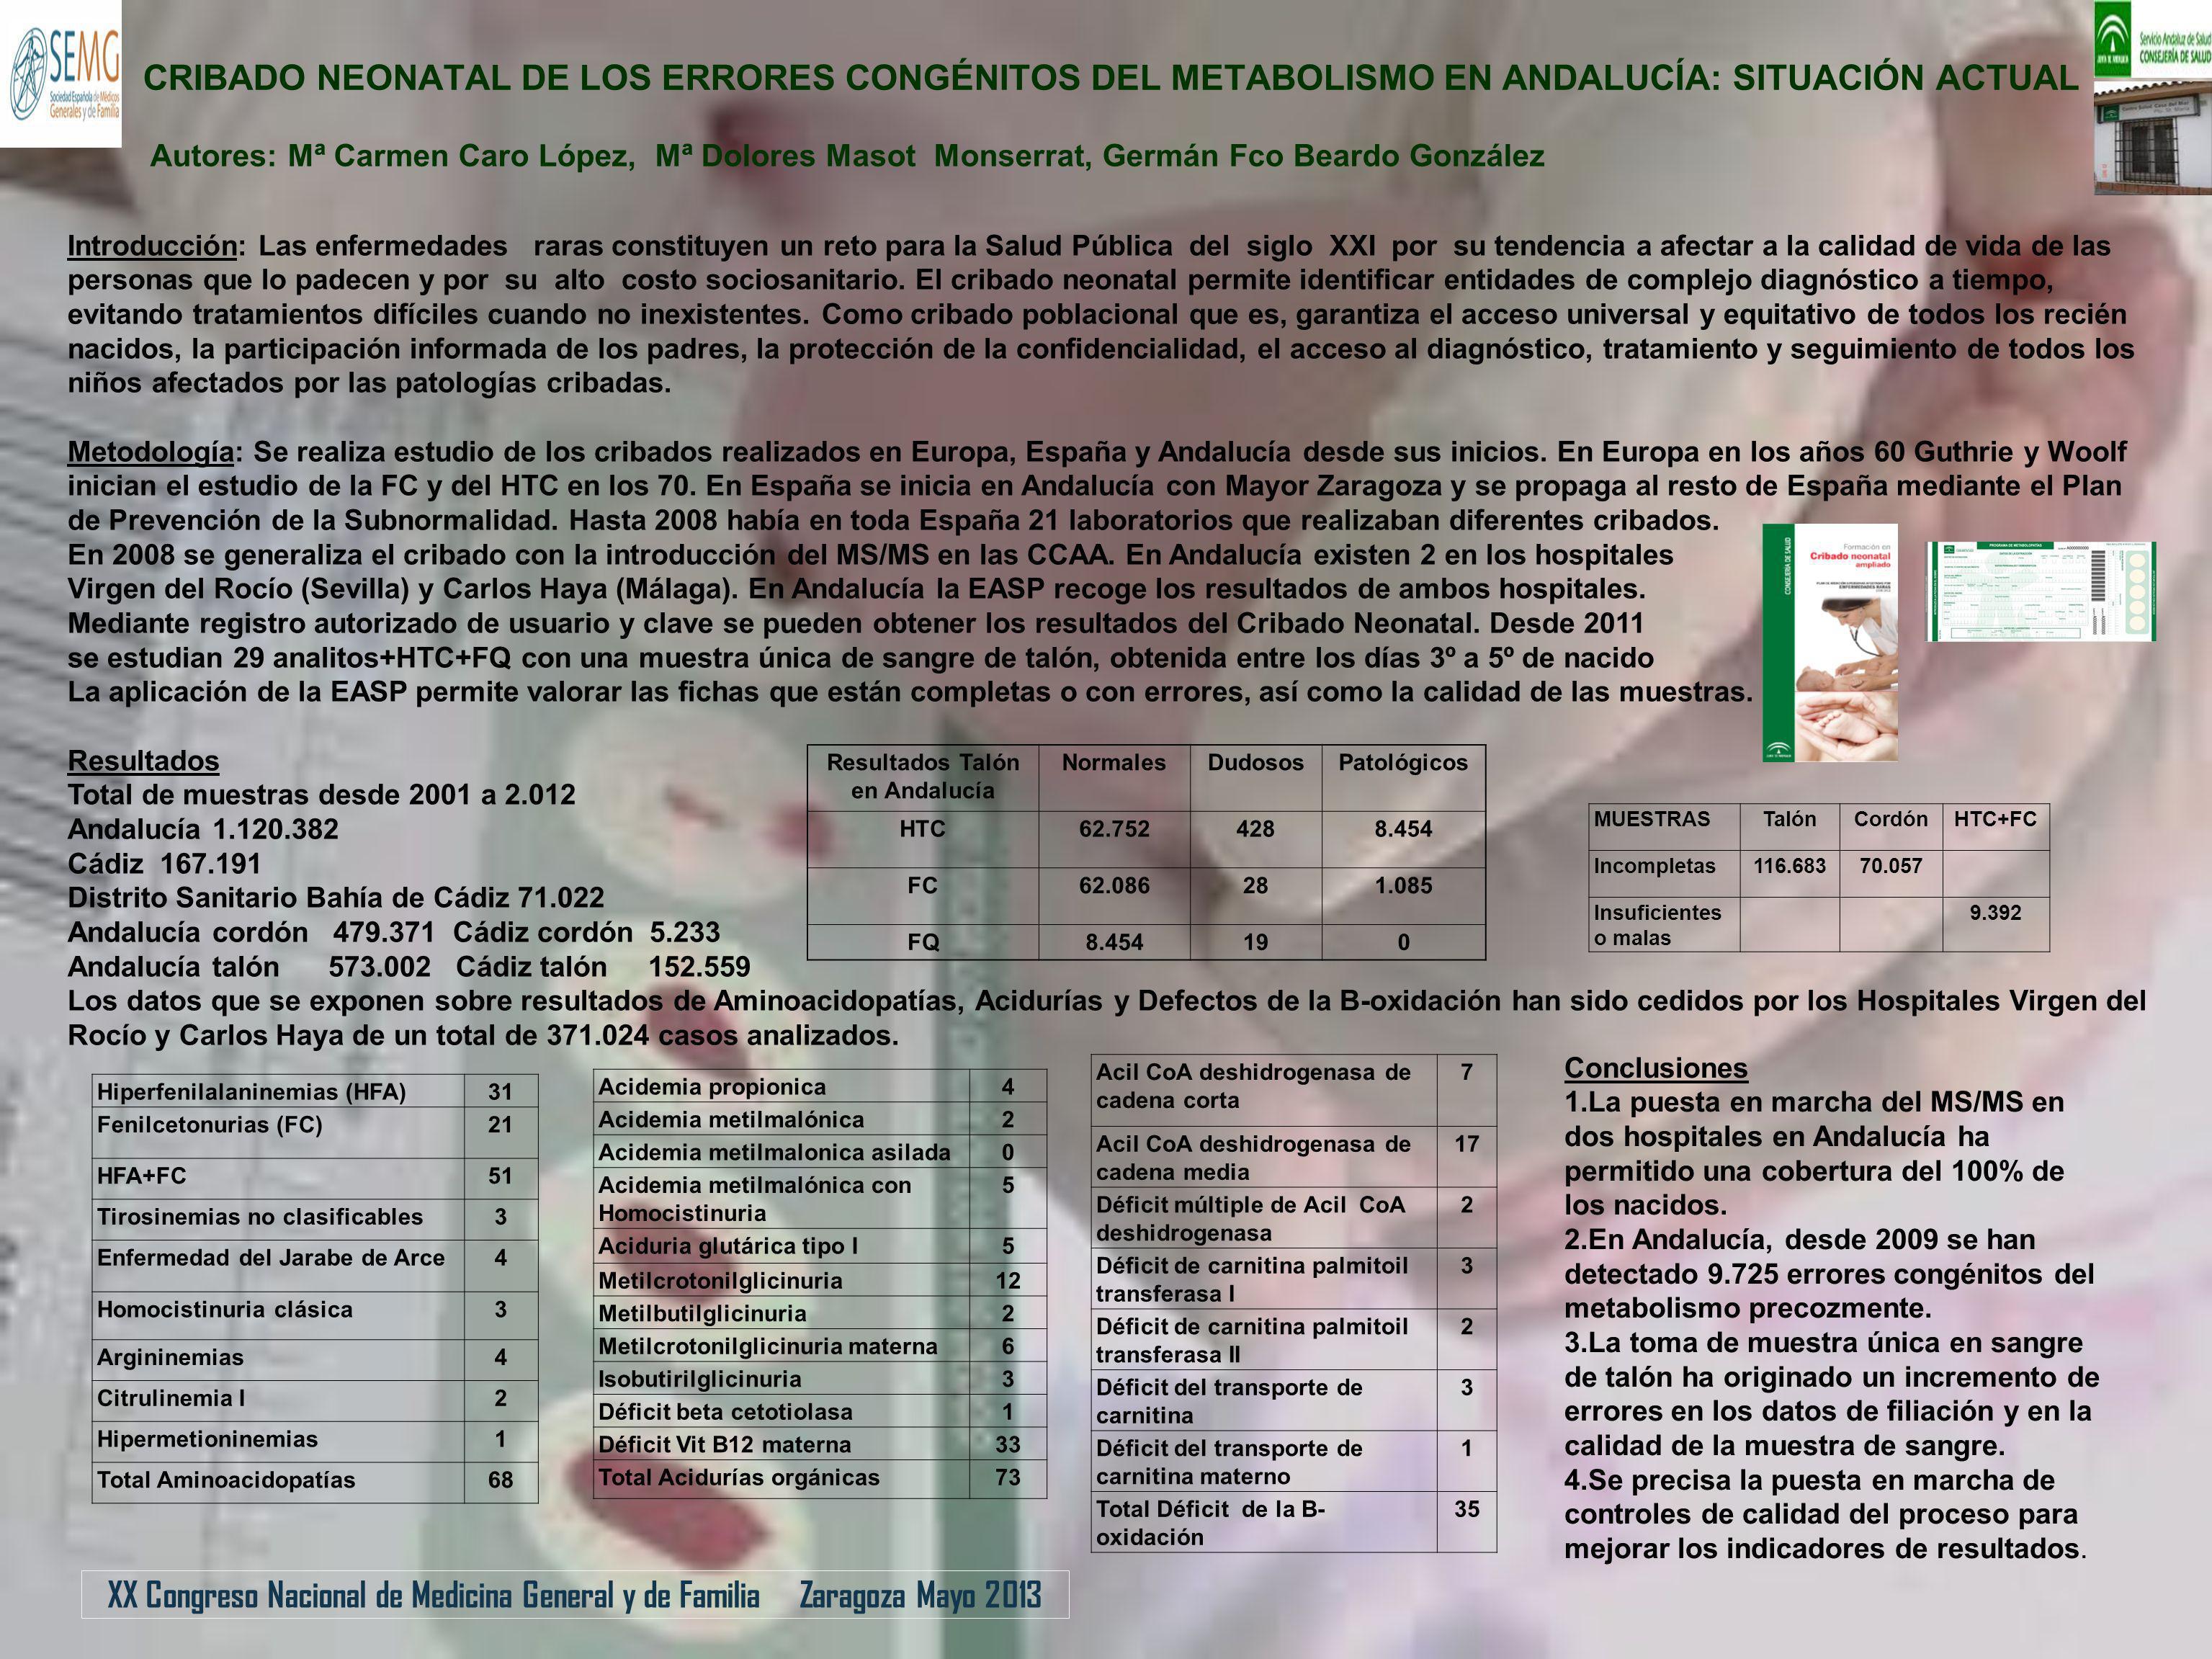 CRIBADO NEONATAL DE LOS ERRORES CONGÉNITOS DEL METABOLISMO EN ANDALUCÍA: SITUACIÓN ACTUAL Autores: Mª Carmen Caro López, Mª Dolores Masot Monserrat, G